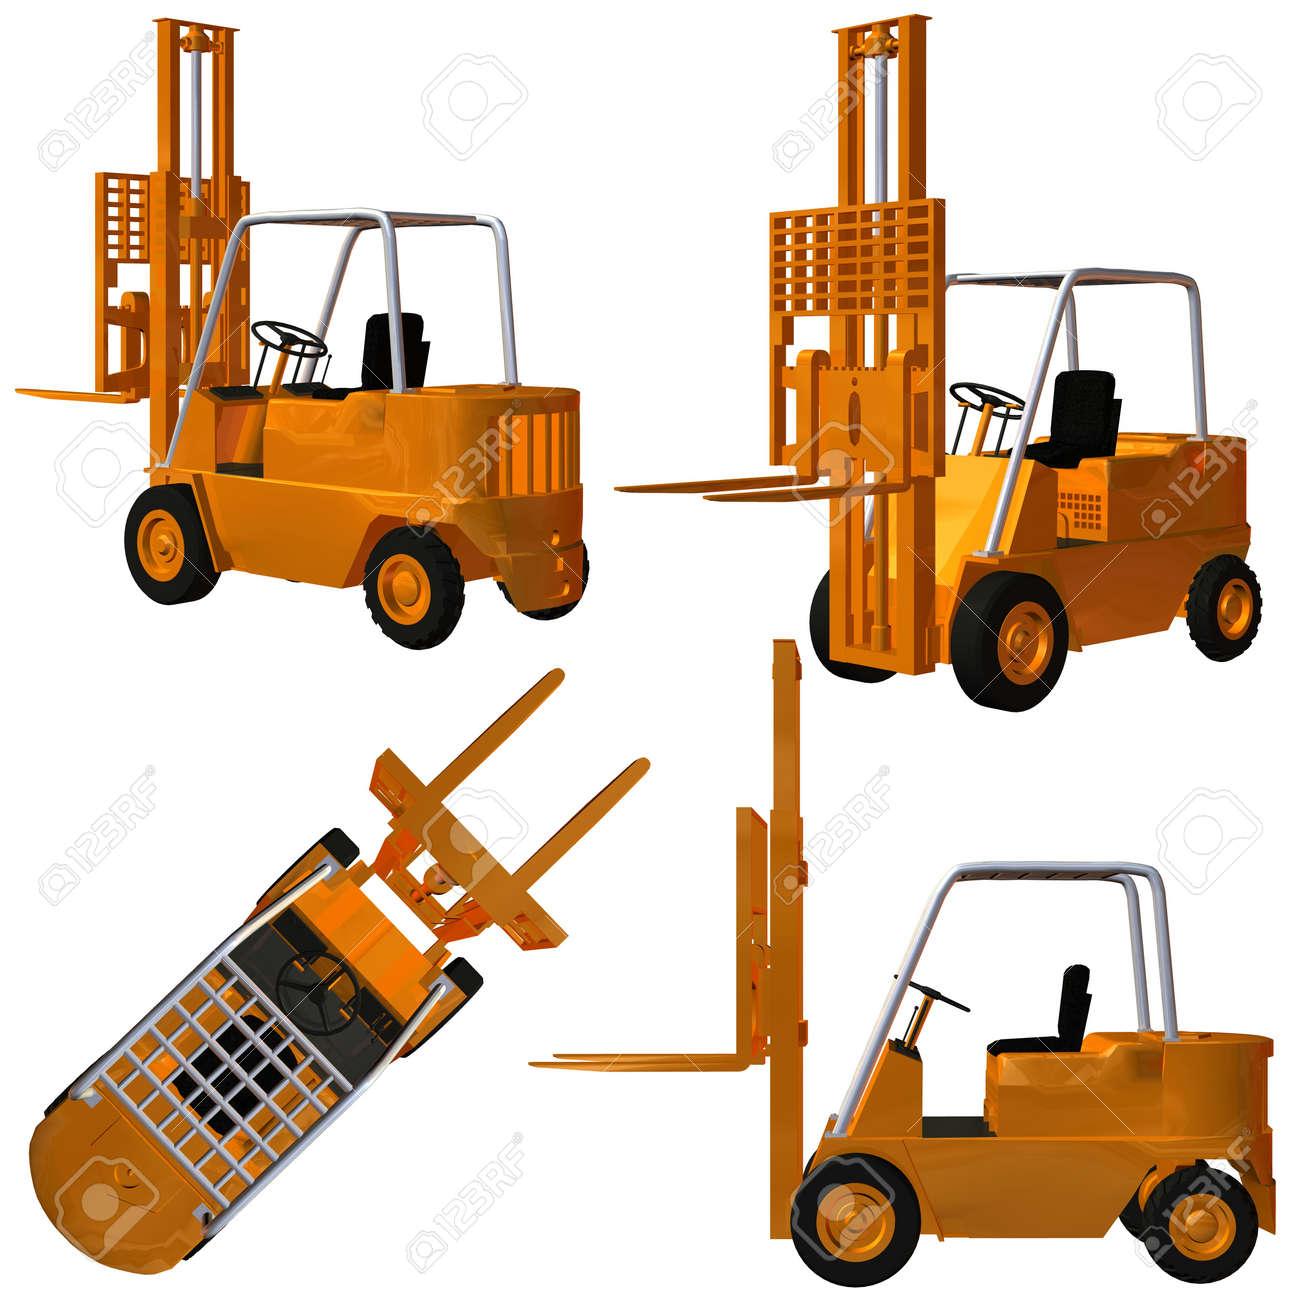 Forklift Stock Photo - 4218551